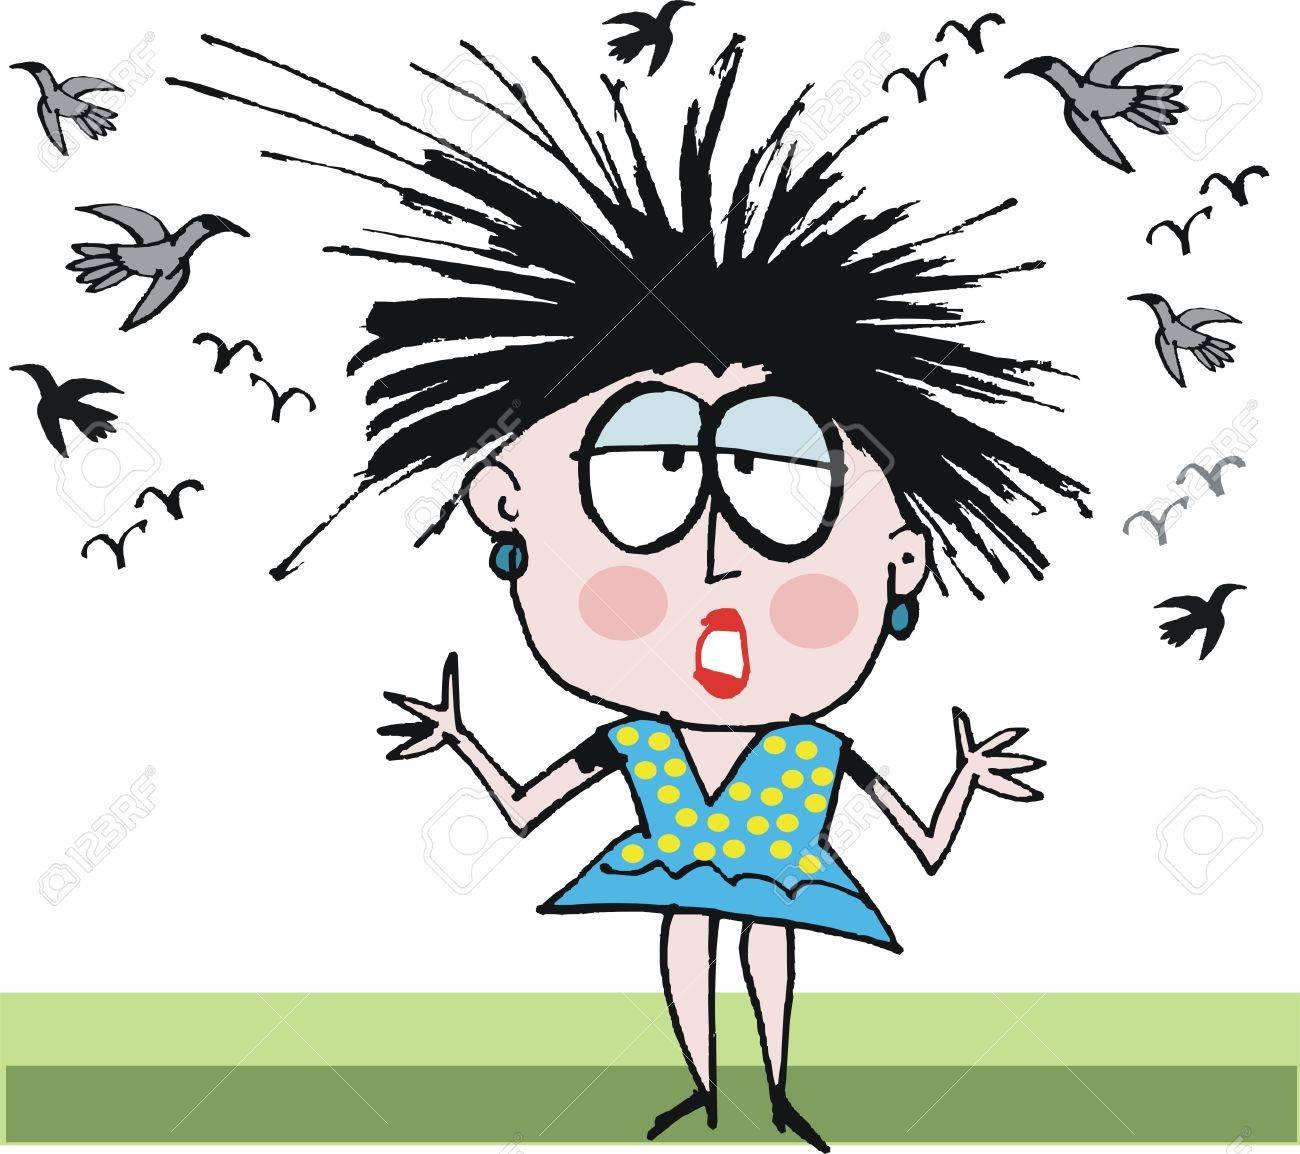 Vector cartoon of woman having bad hair day.